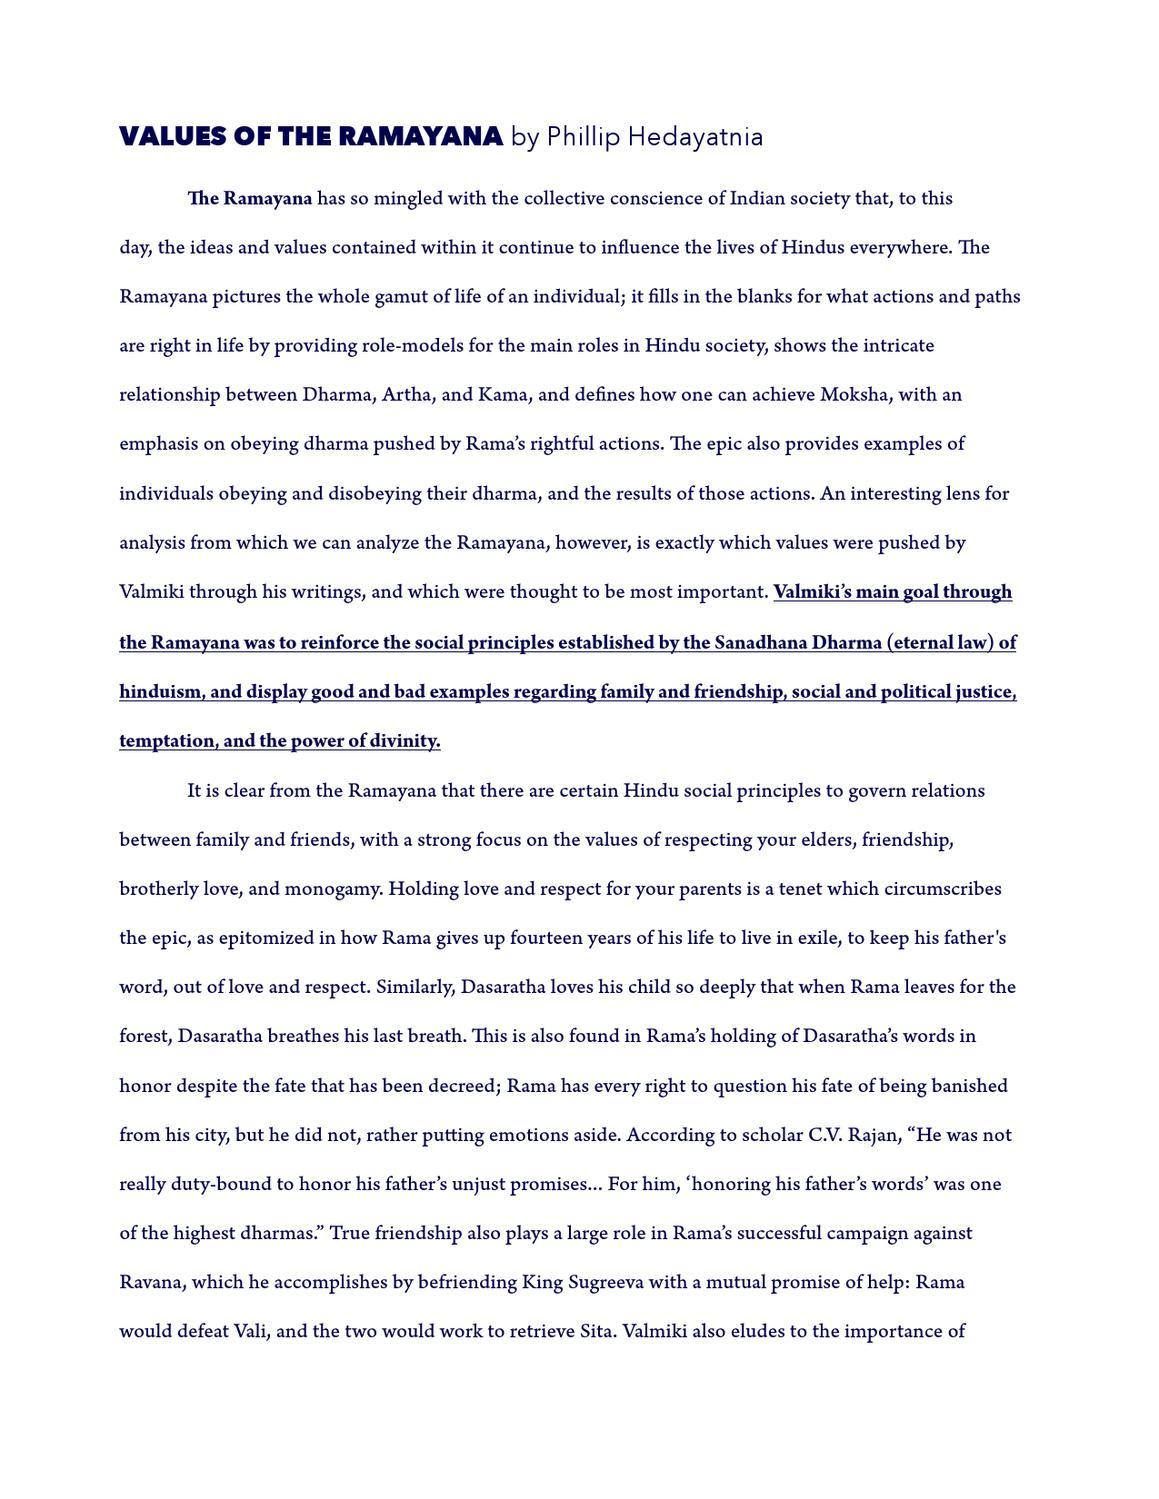 the ramayana essay example